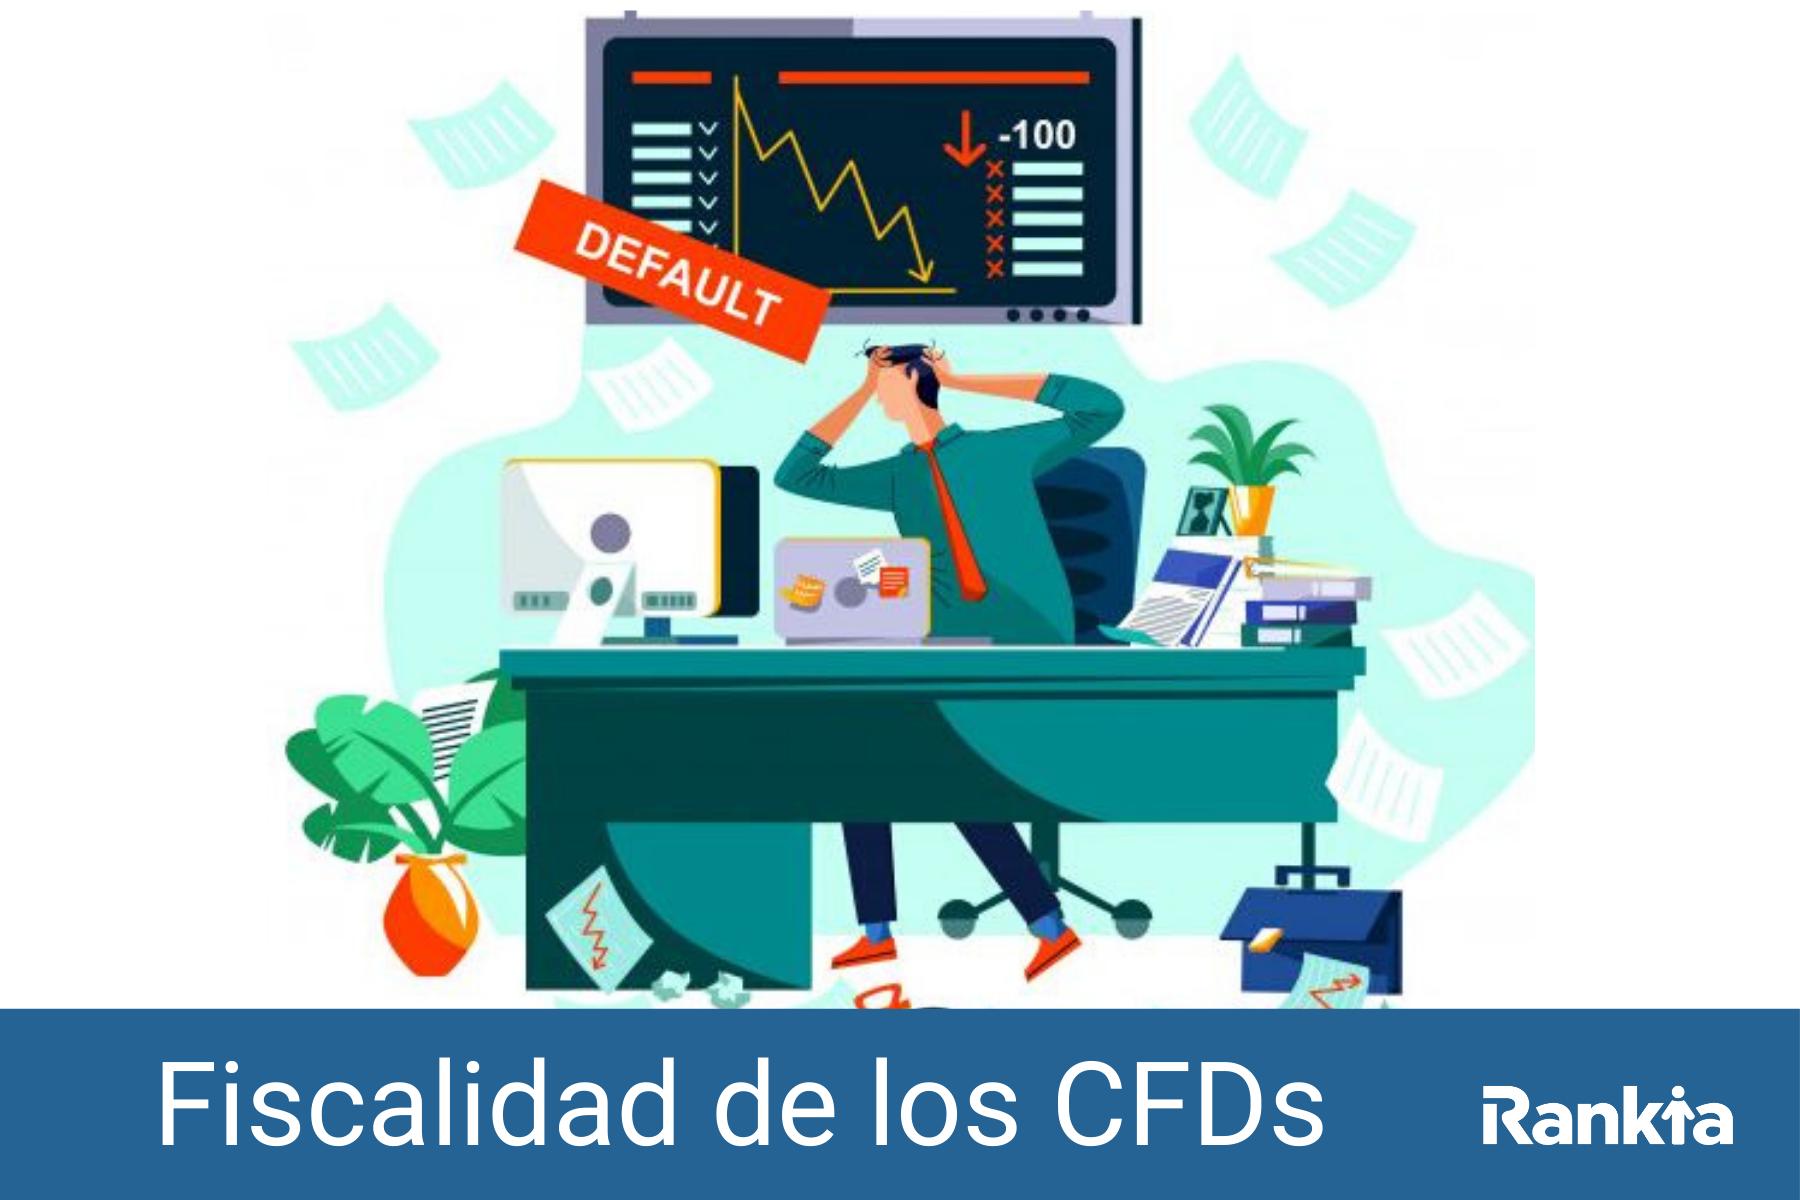 Fiscalidad de los CFDs